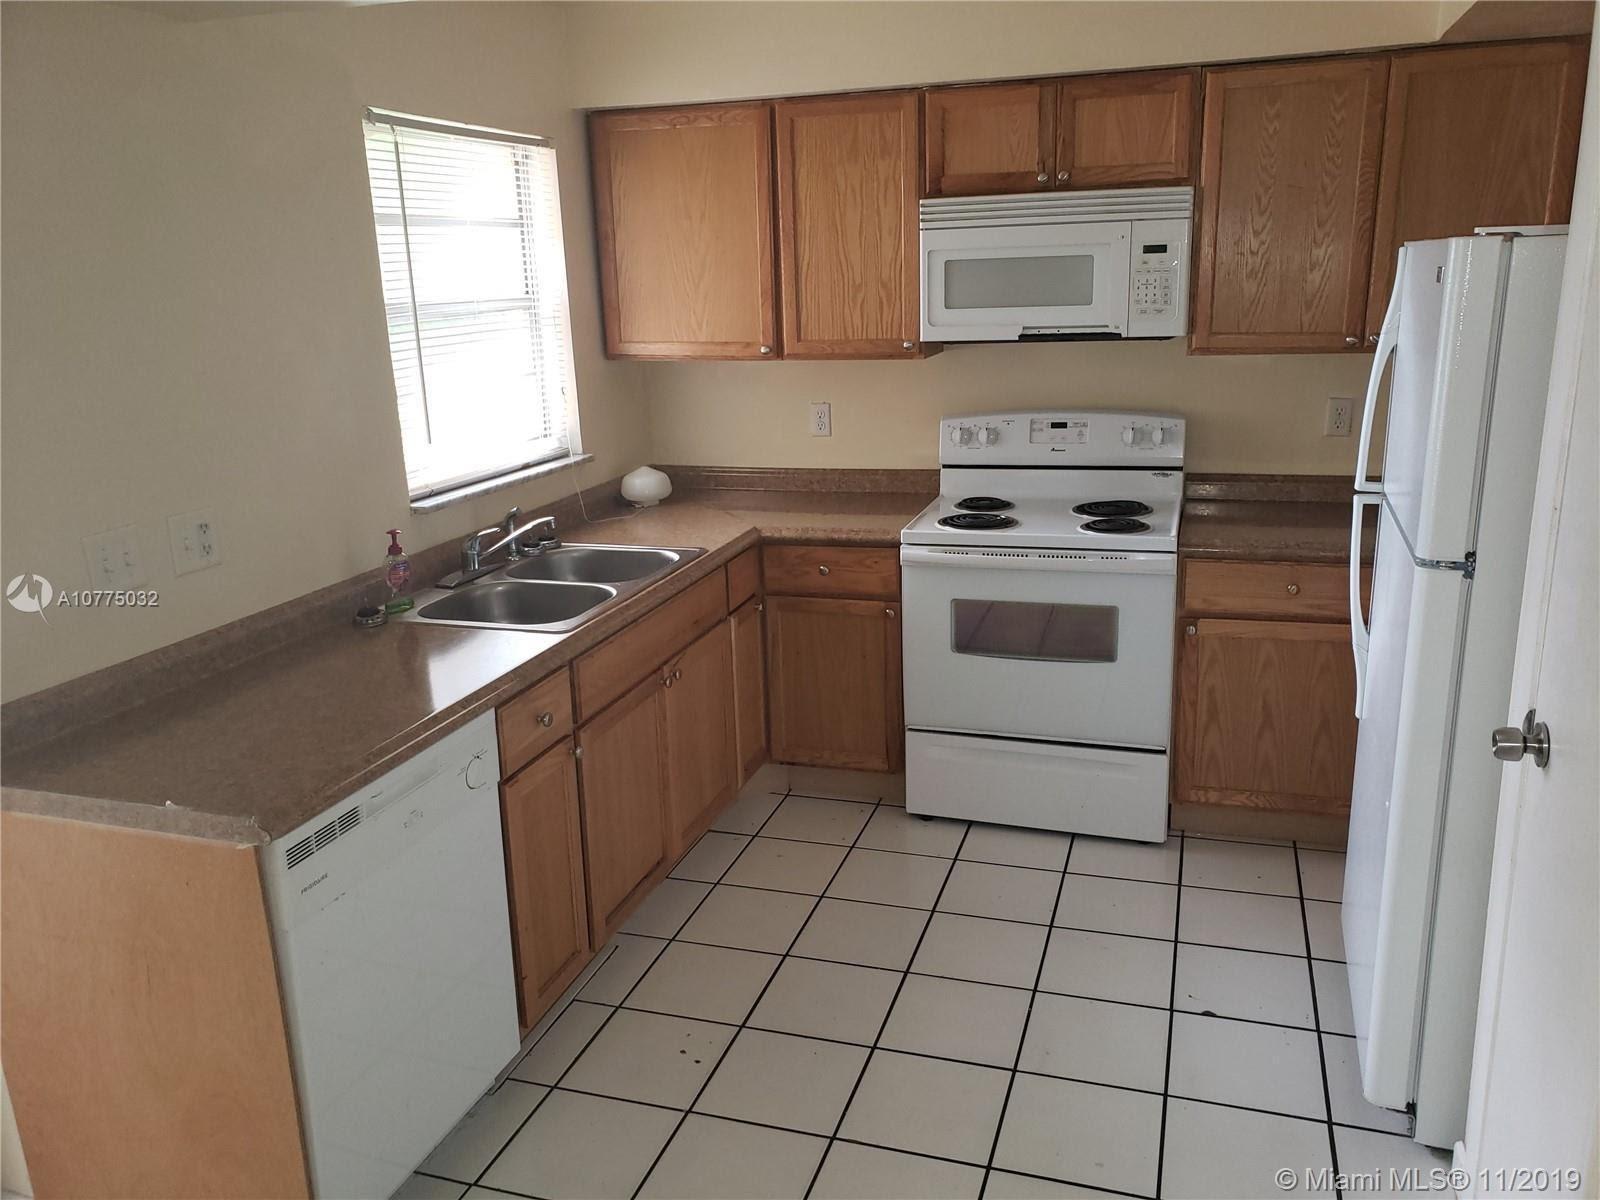 342 NE Solida Cir Port St. Lucie, FL 34983, USA